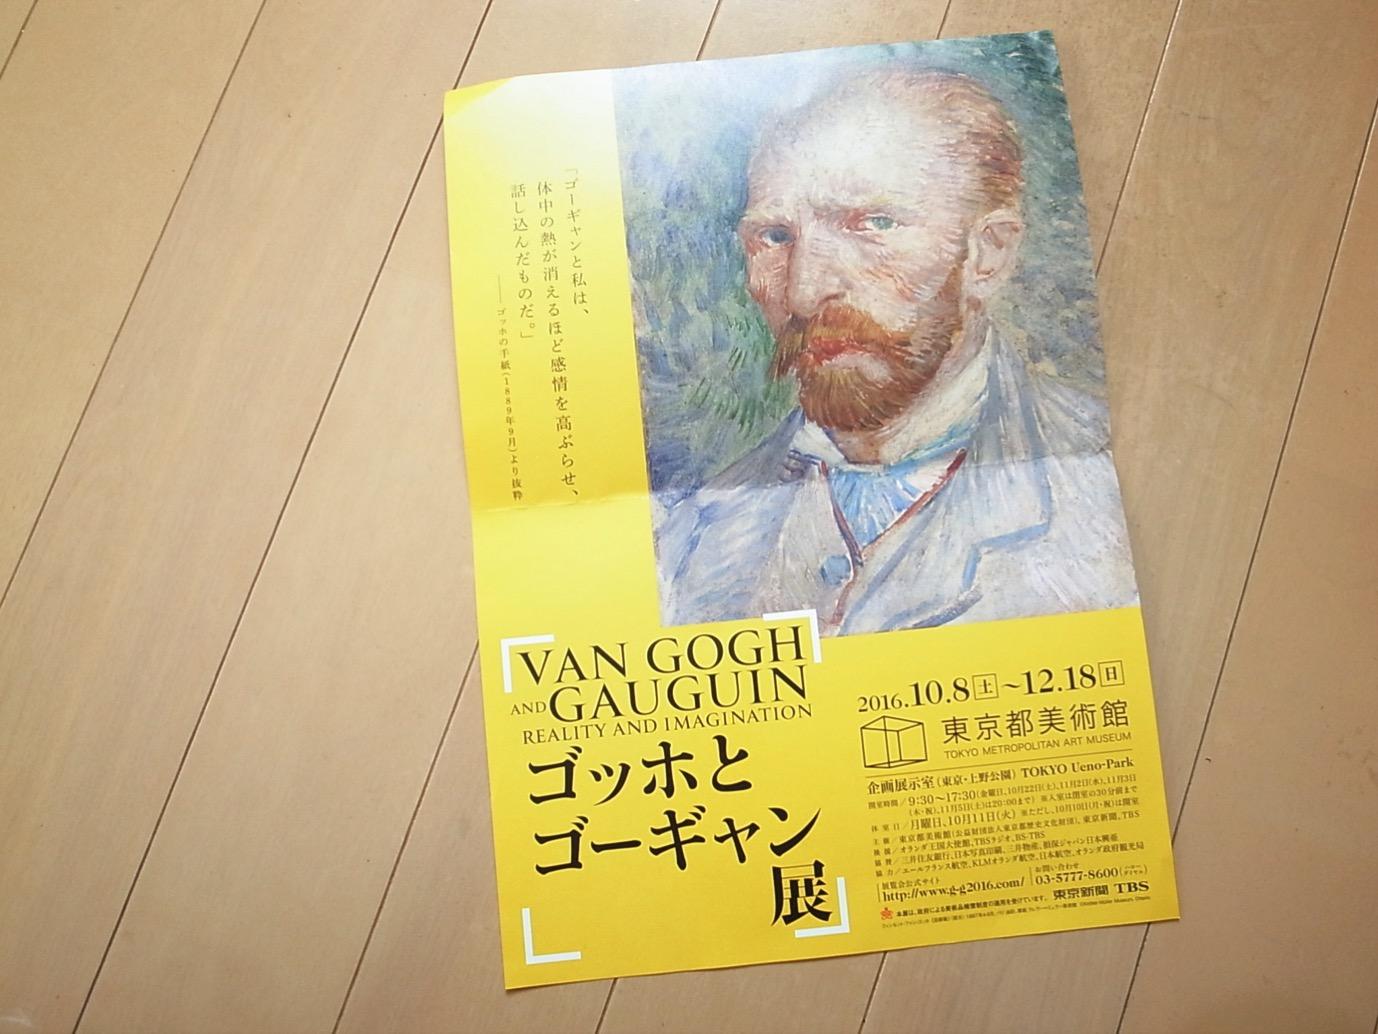 Gogh and gauguin 1